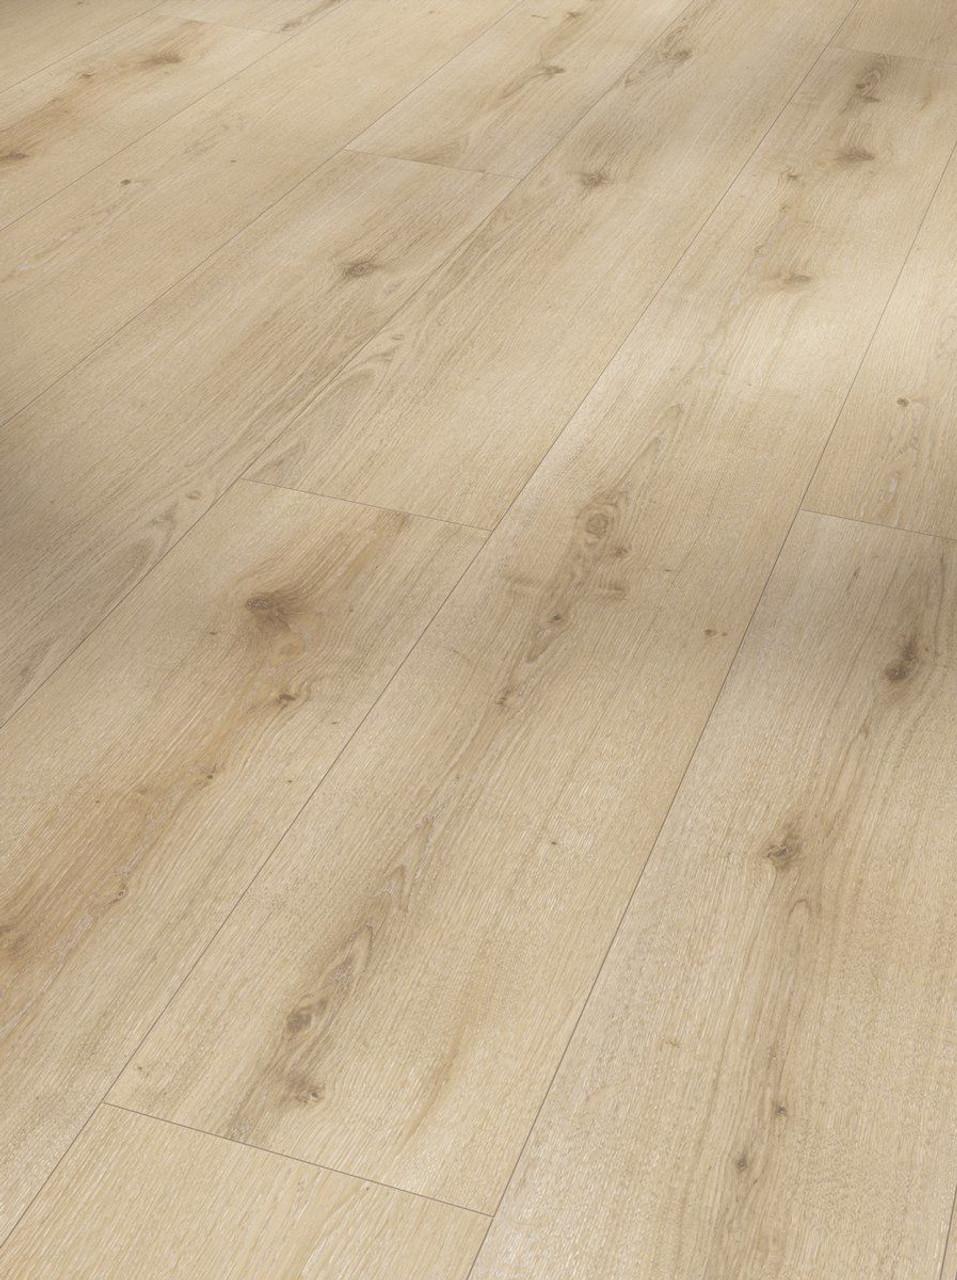 Parador Modular One Oak Urban Light Limed Wide Plank Resilient Flooring